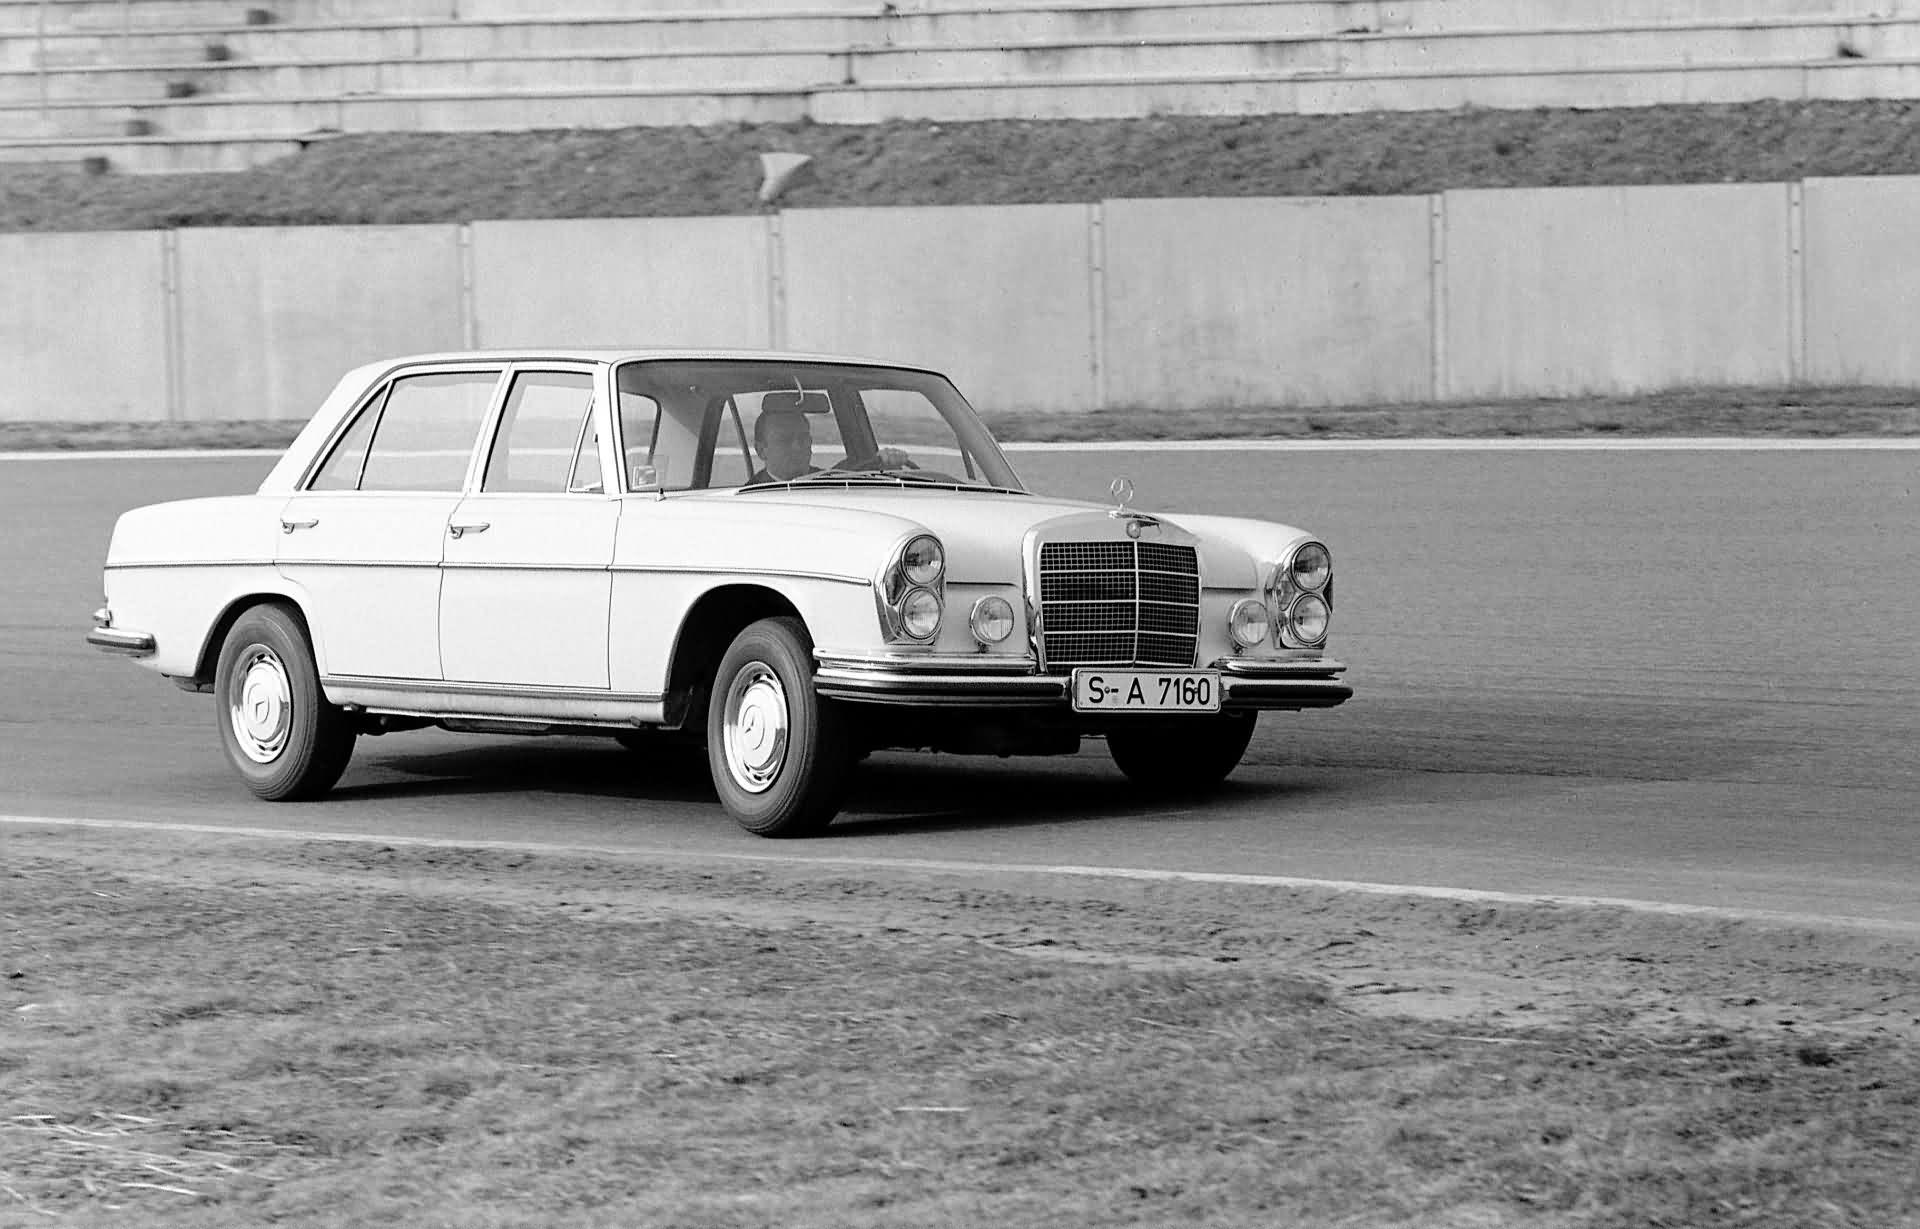 Mercedes-Benz 300 SEL - W 109